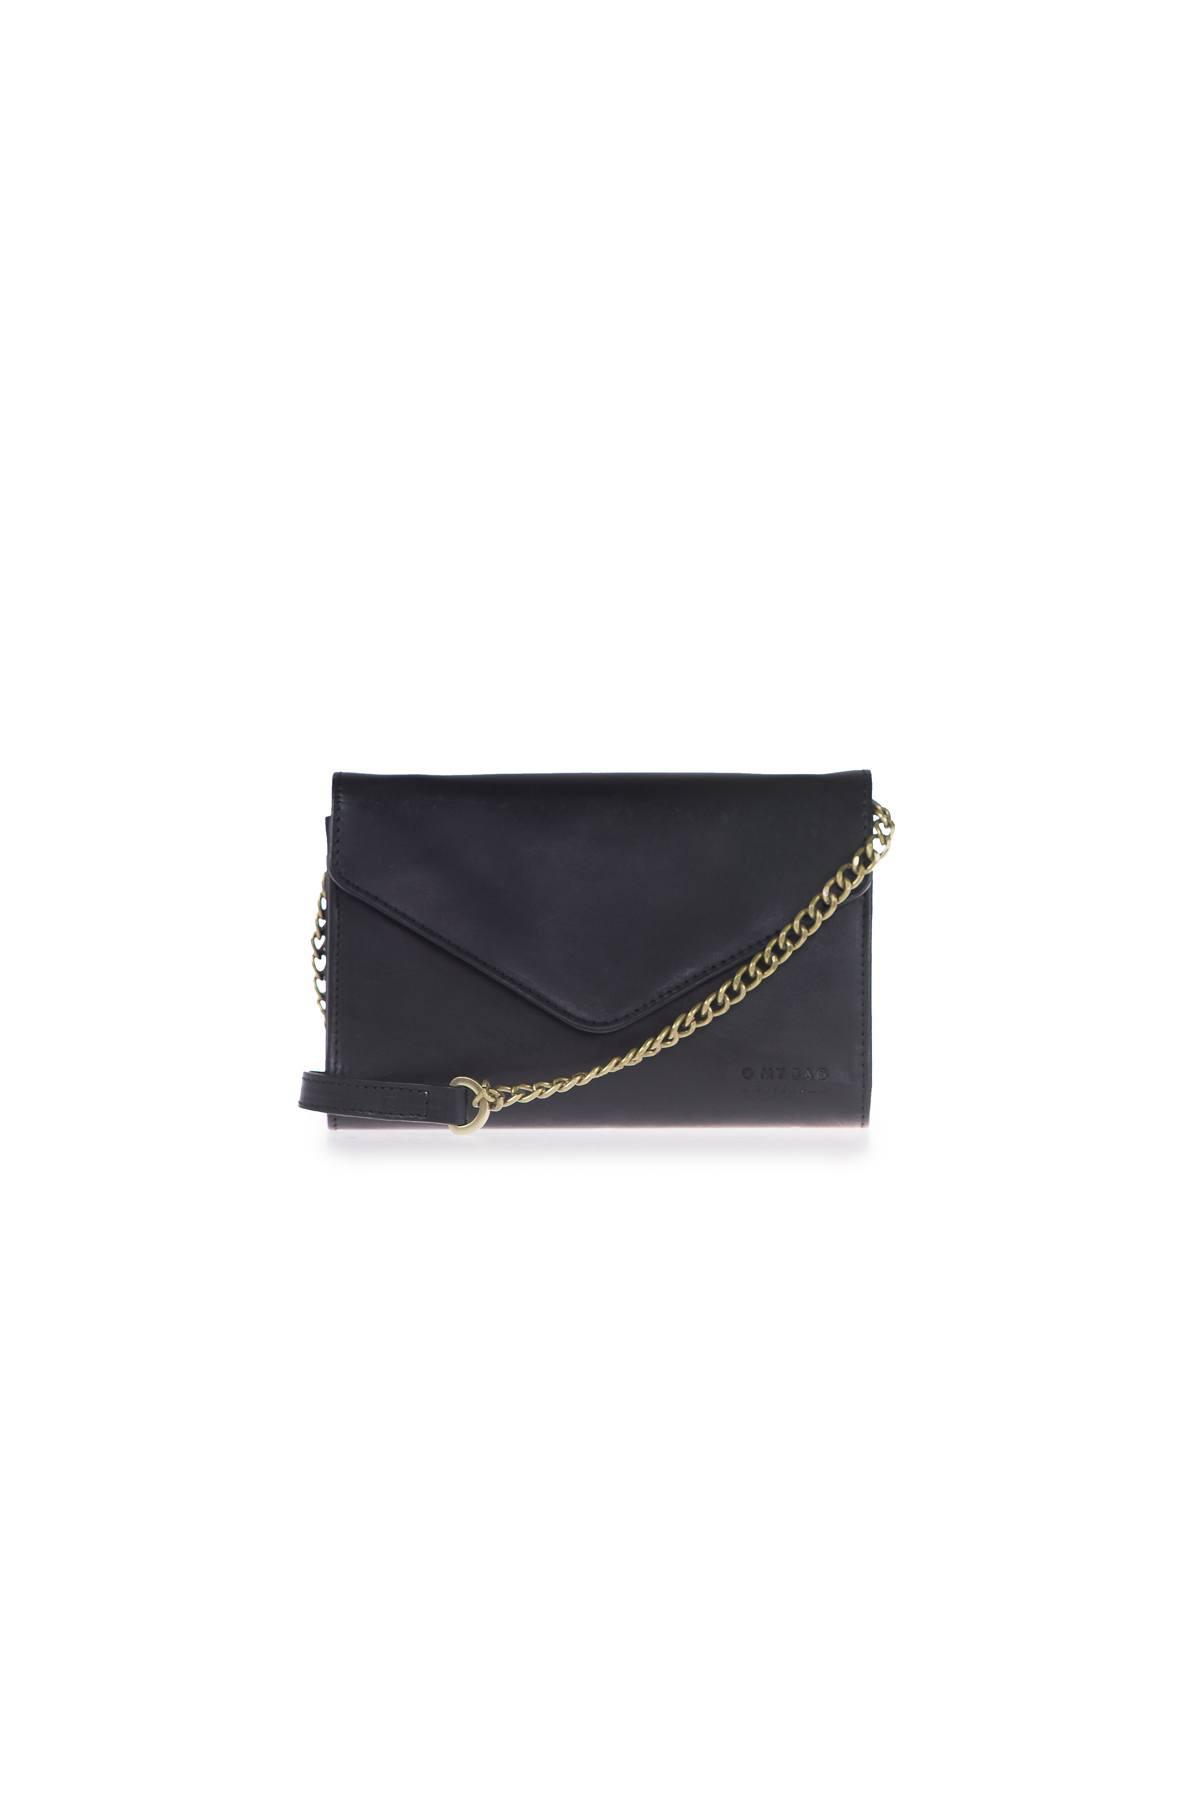 Josephine Chain Bag - Black Classic Leather-1